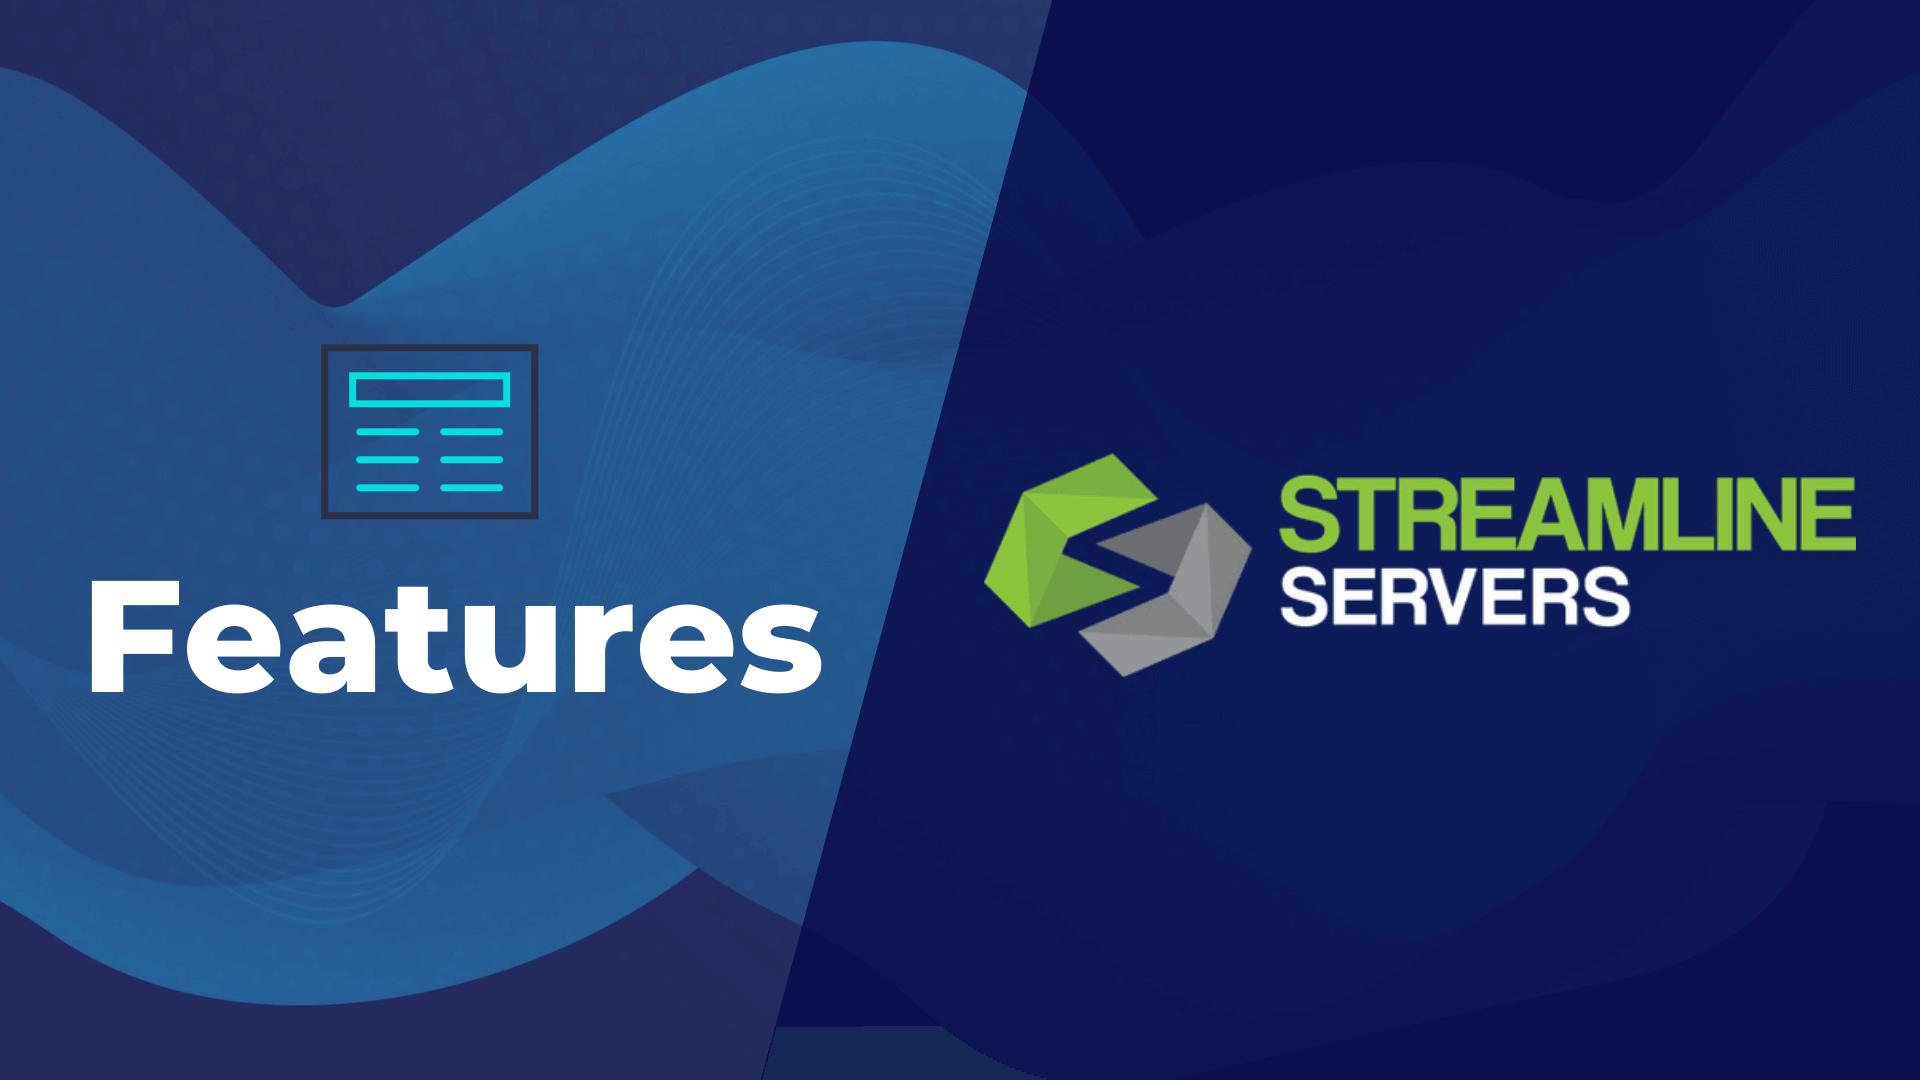 Streamline Servers Features